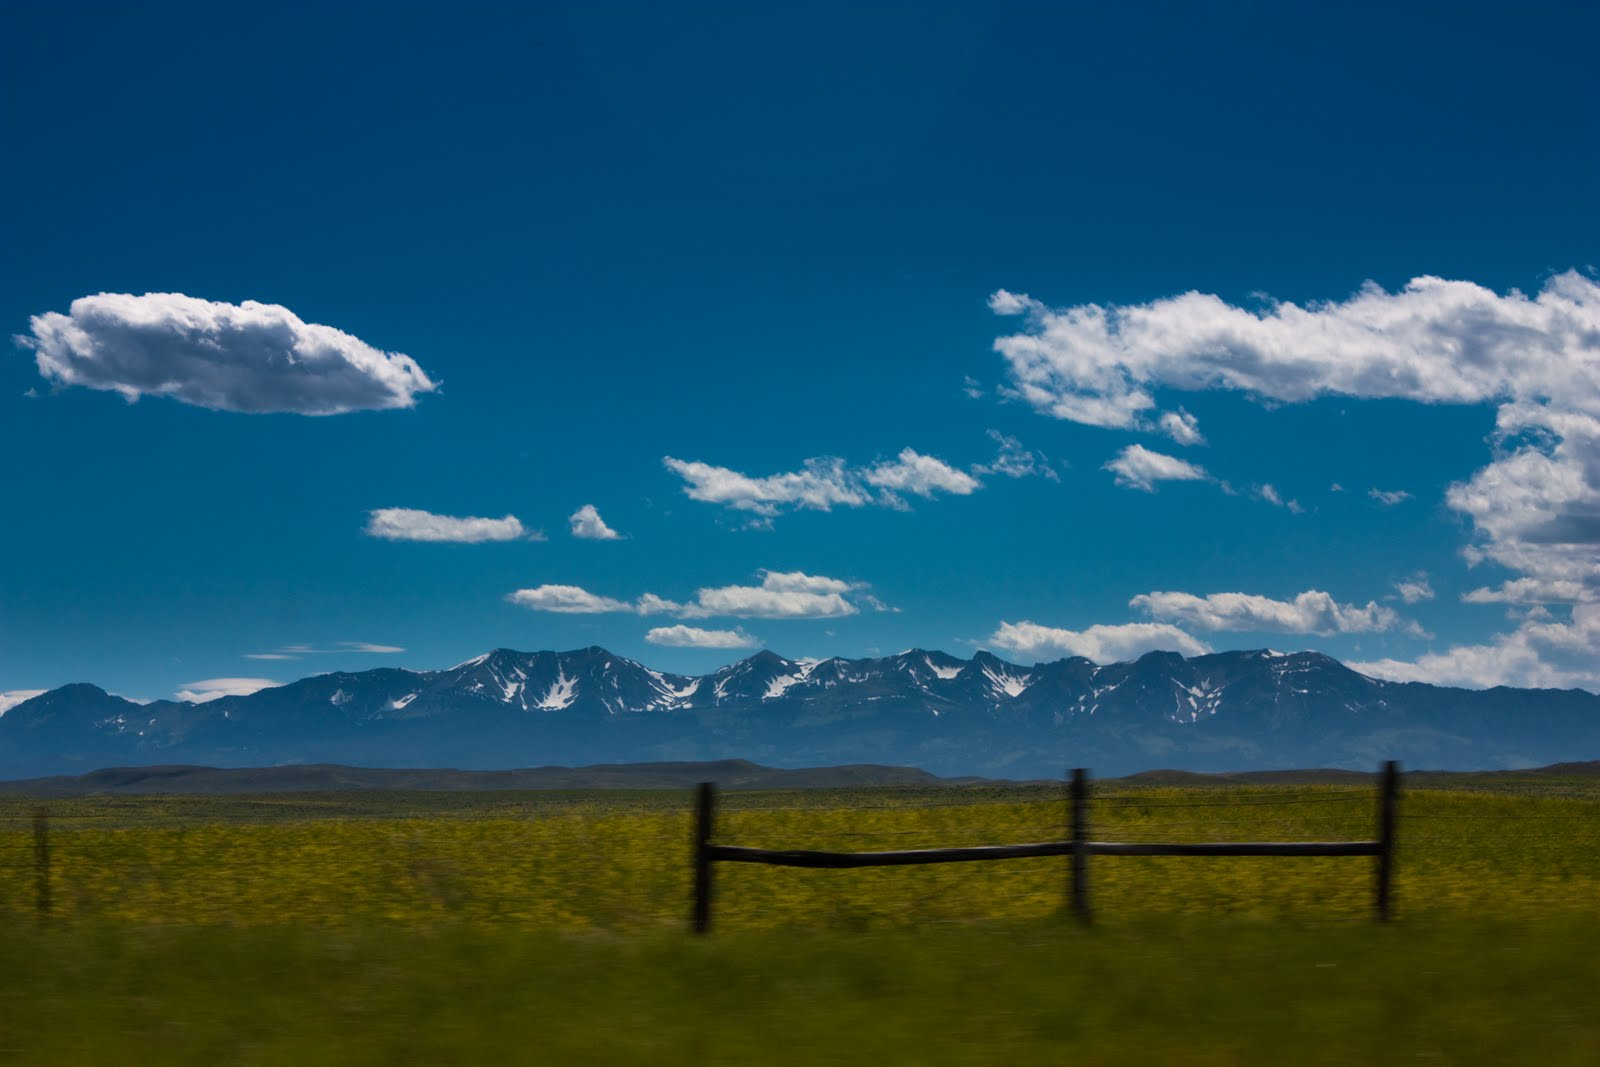 Montana Skies  by Maple-Dawn Thomsen